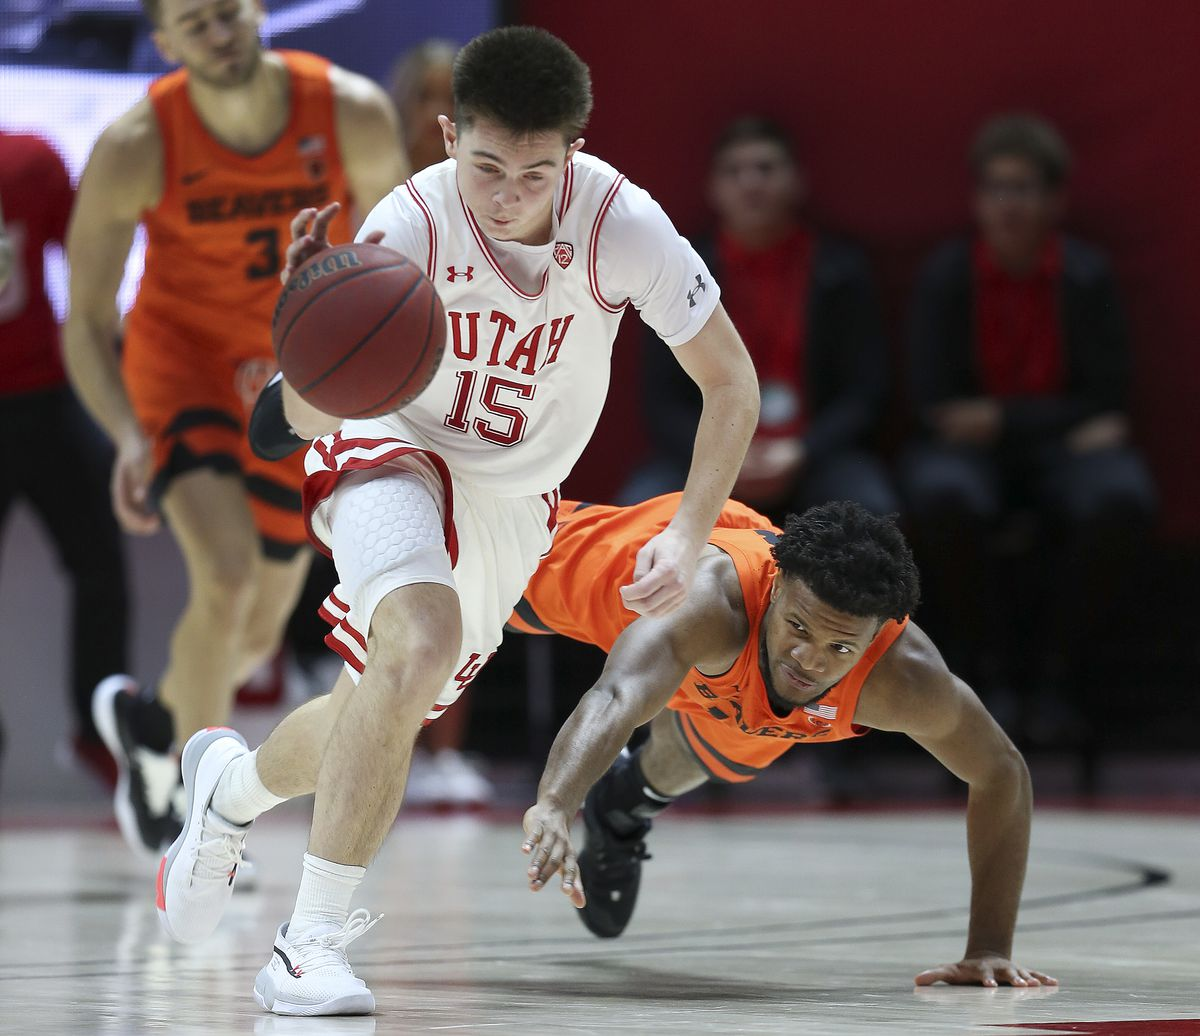 Utah Utes guard Rylan Jones (15) is fouled by Oregon State Beavers guard Antoine Vernon (13) in Salt Lake City on Thursday, Jan. 2, 2020. Utah won 81-69.